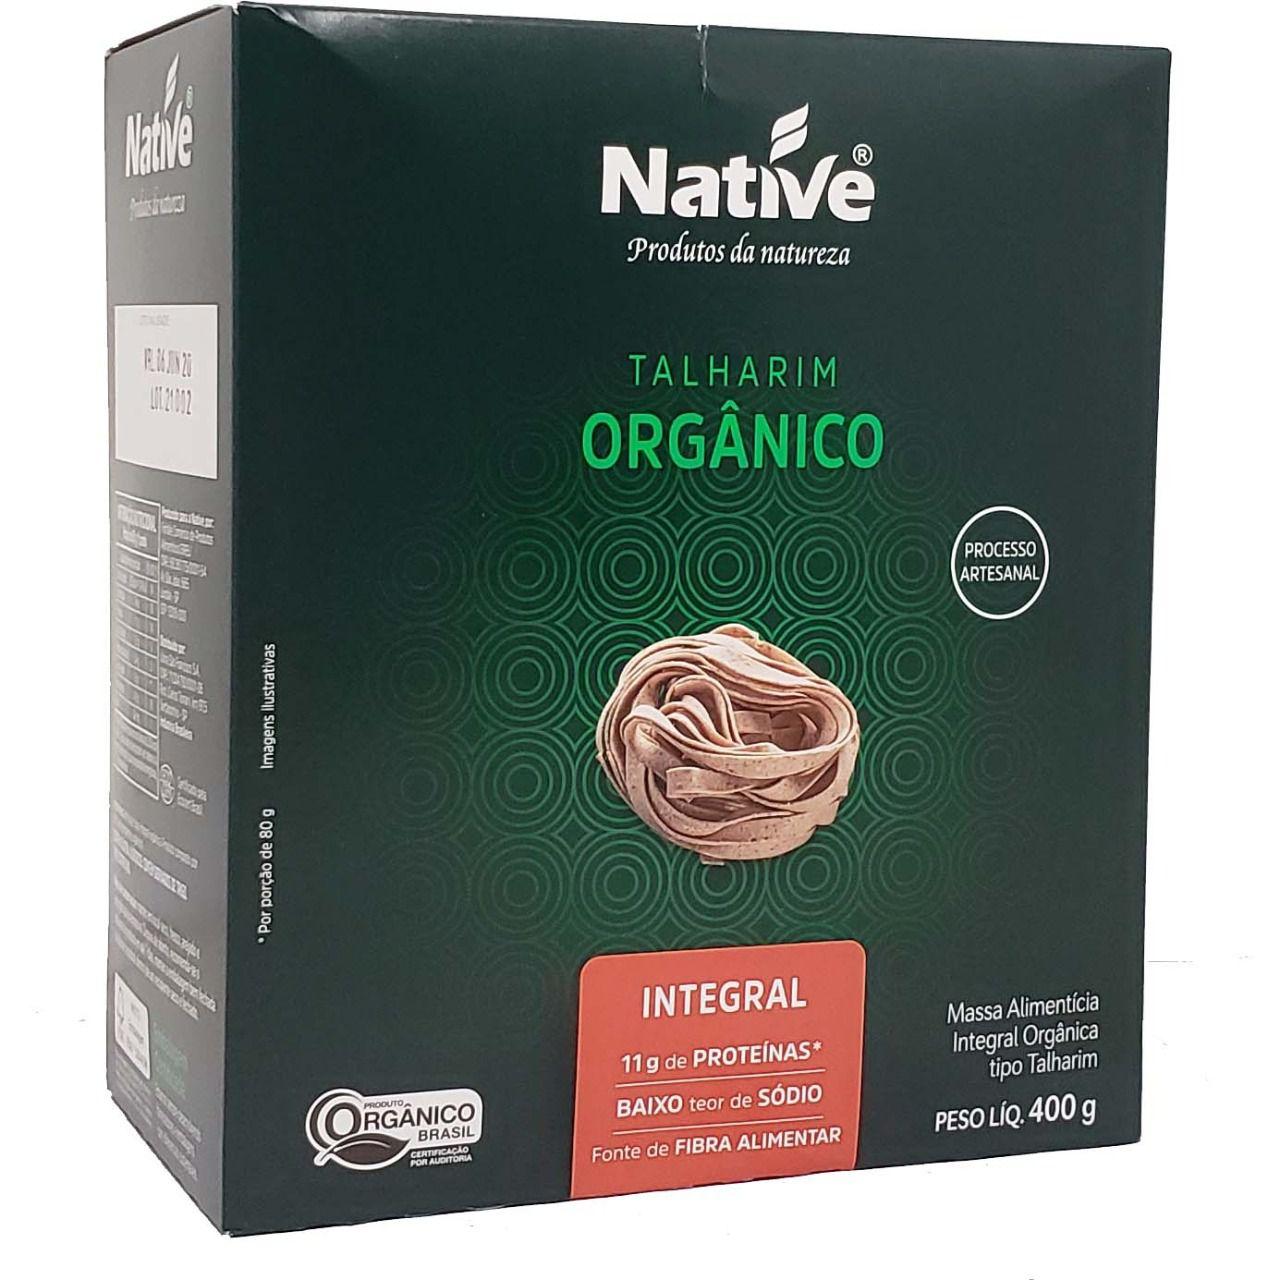 Talharim Orgânico Integral Native - 400g -